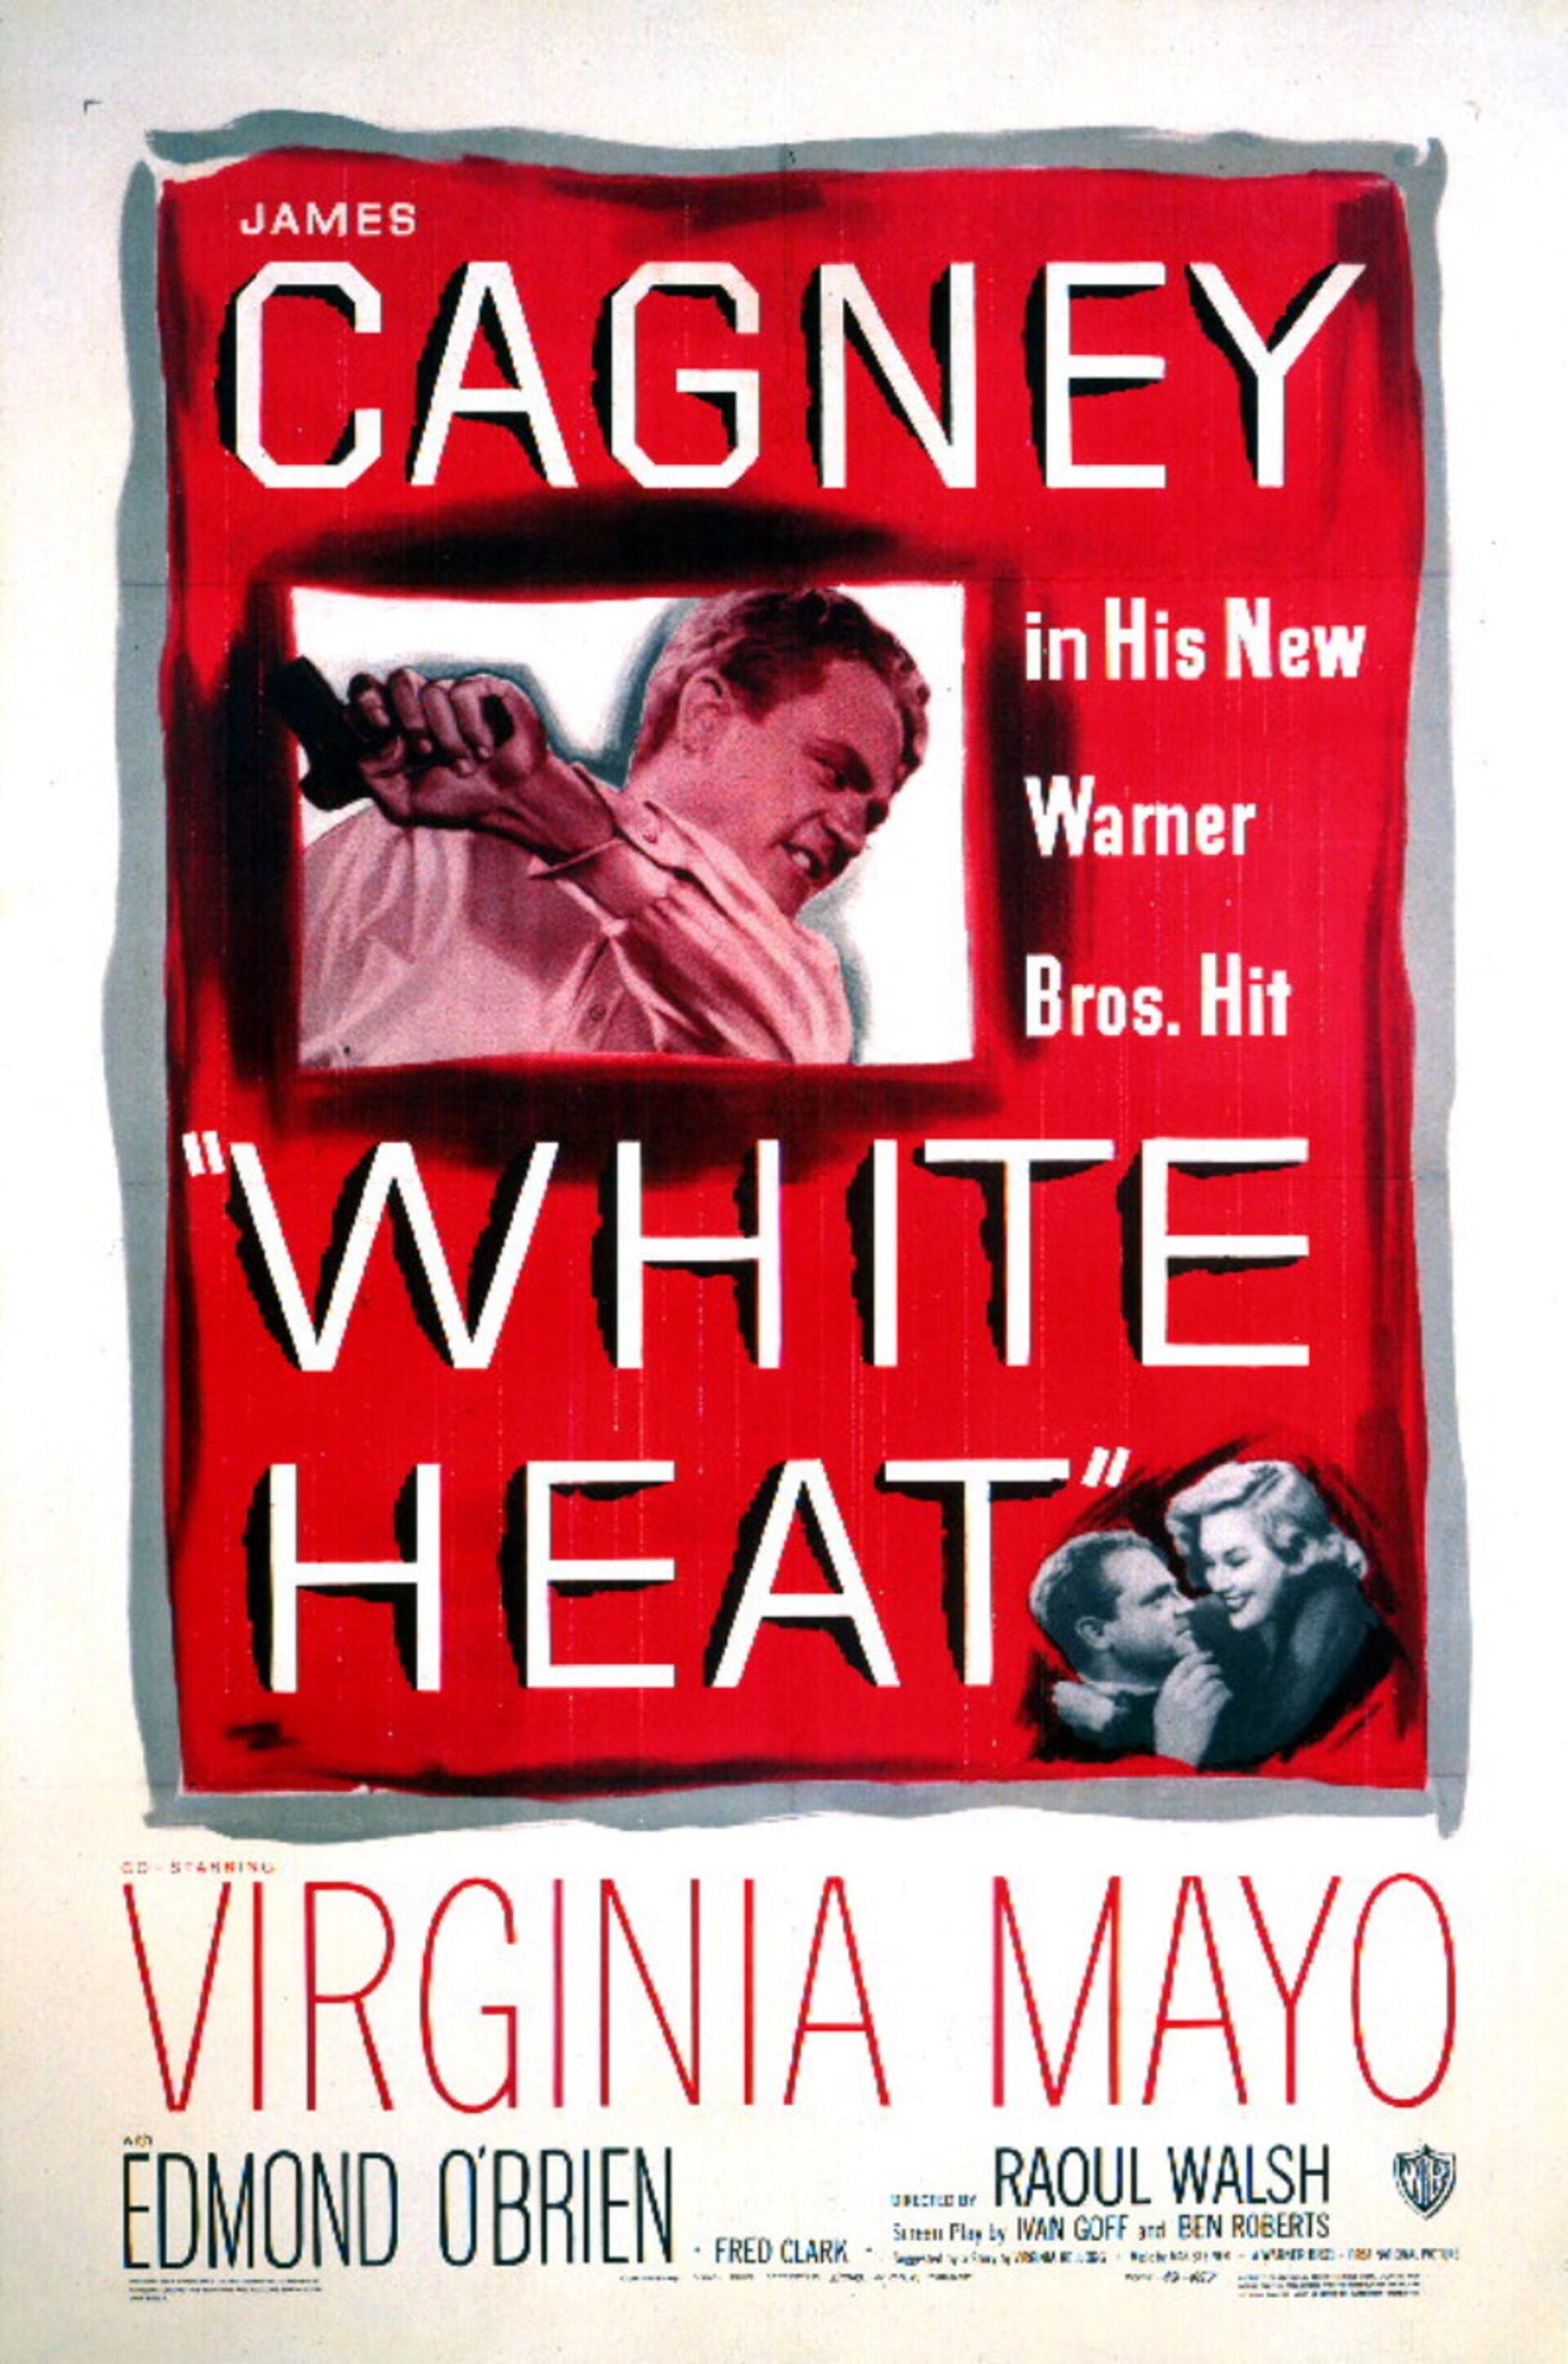 White Heat - Poster 1